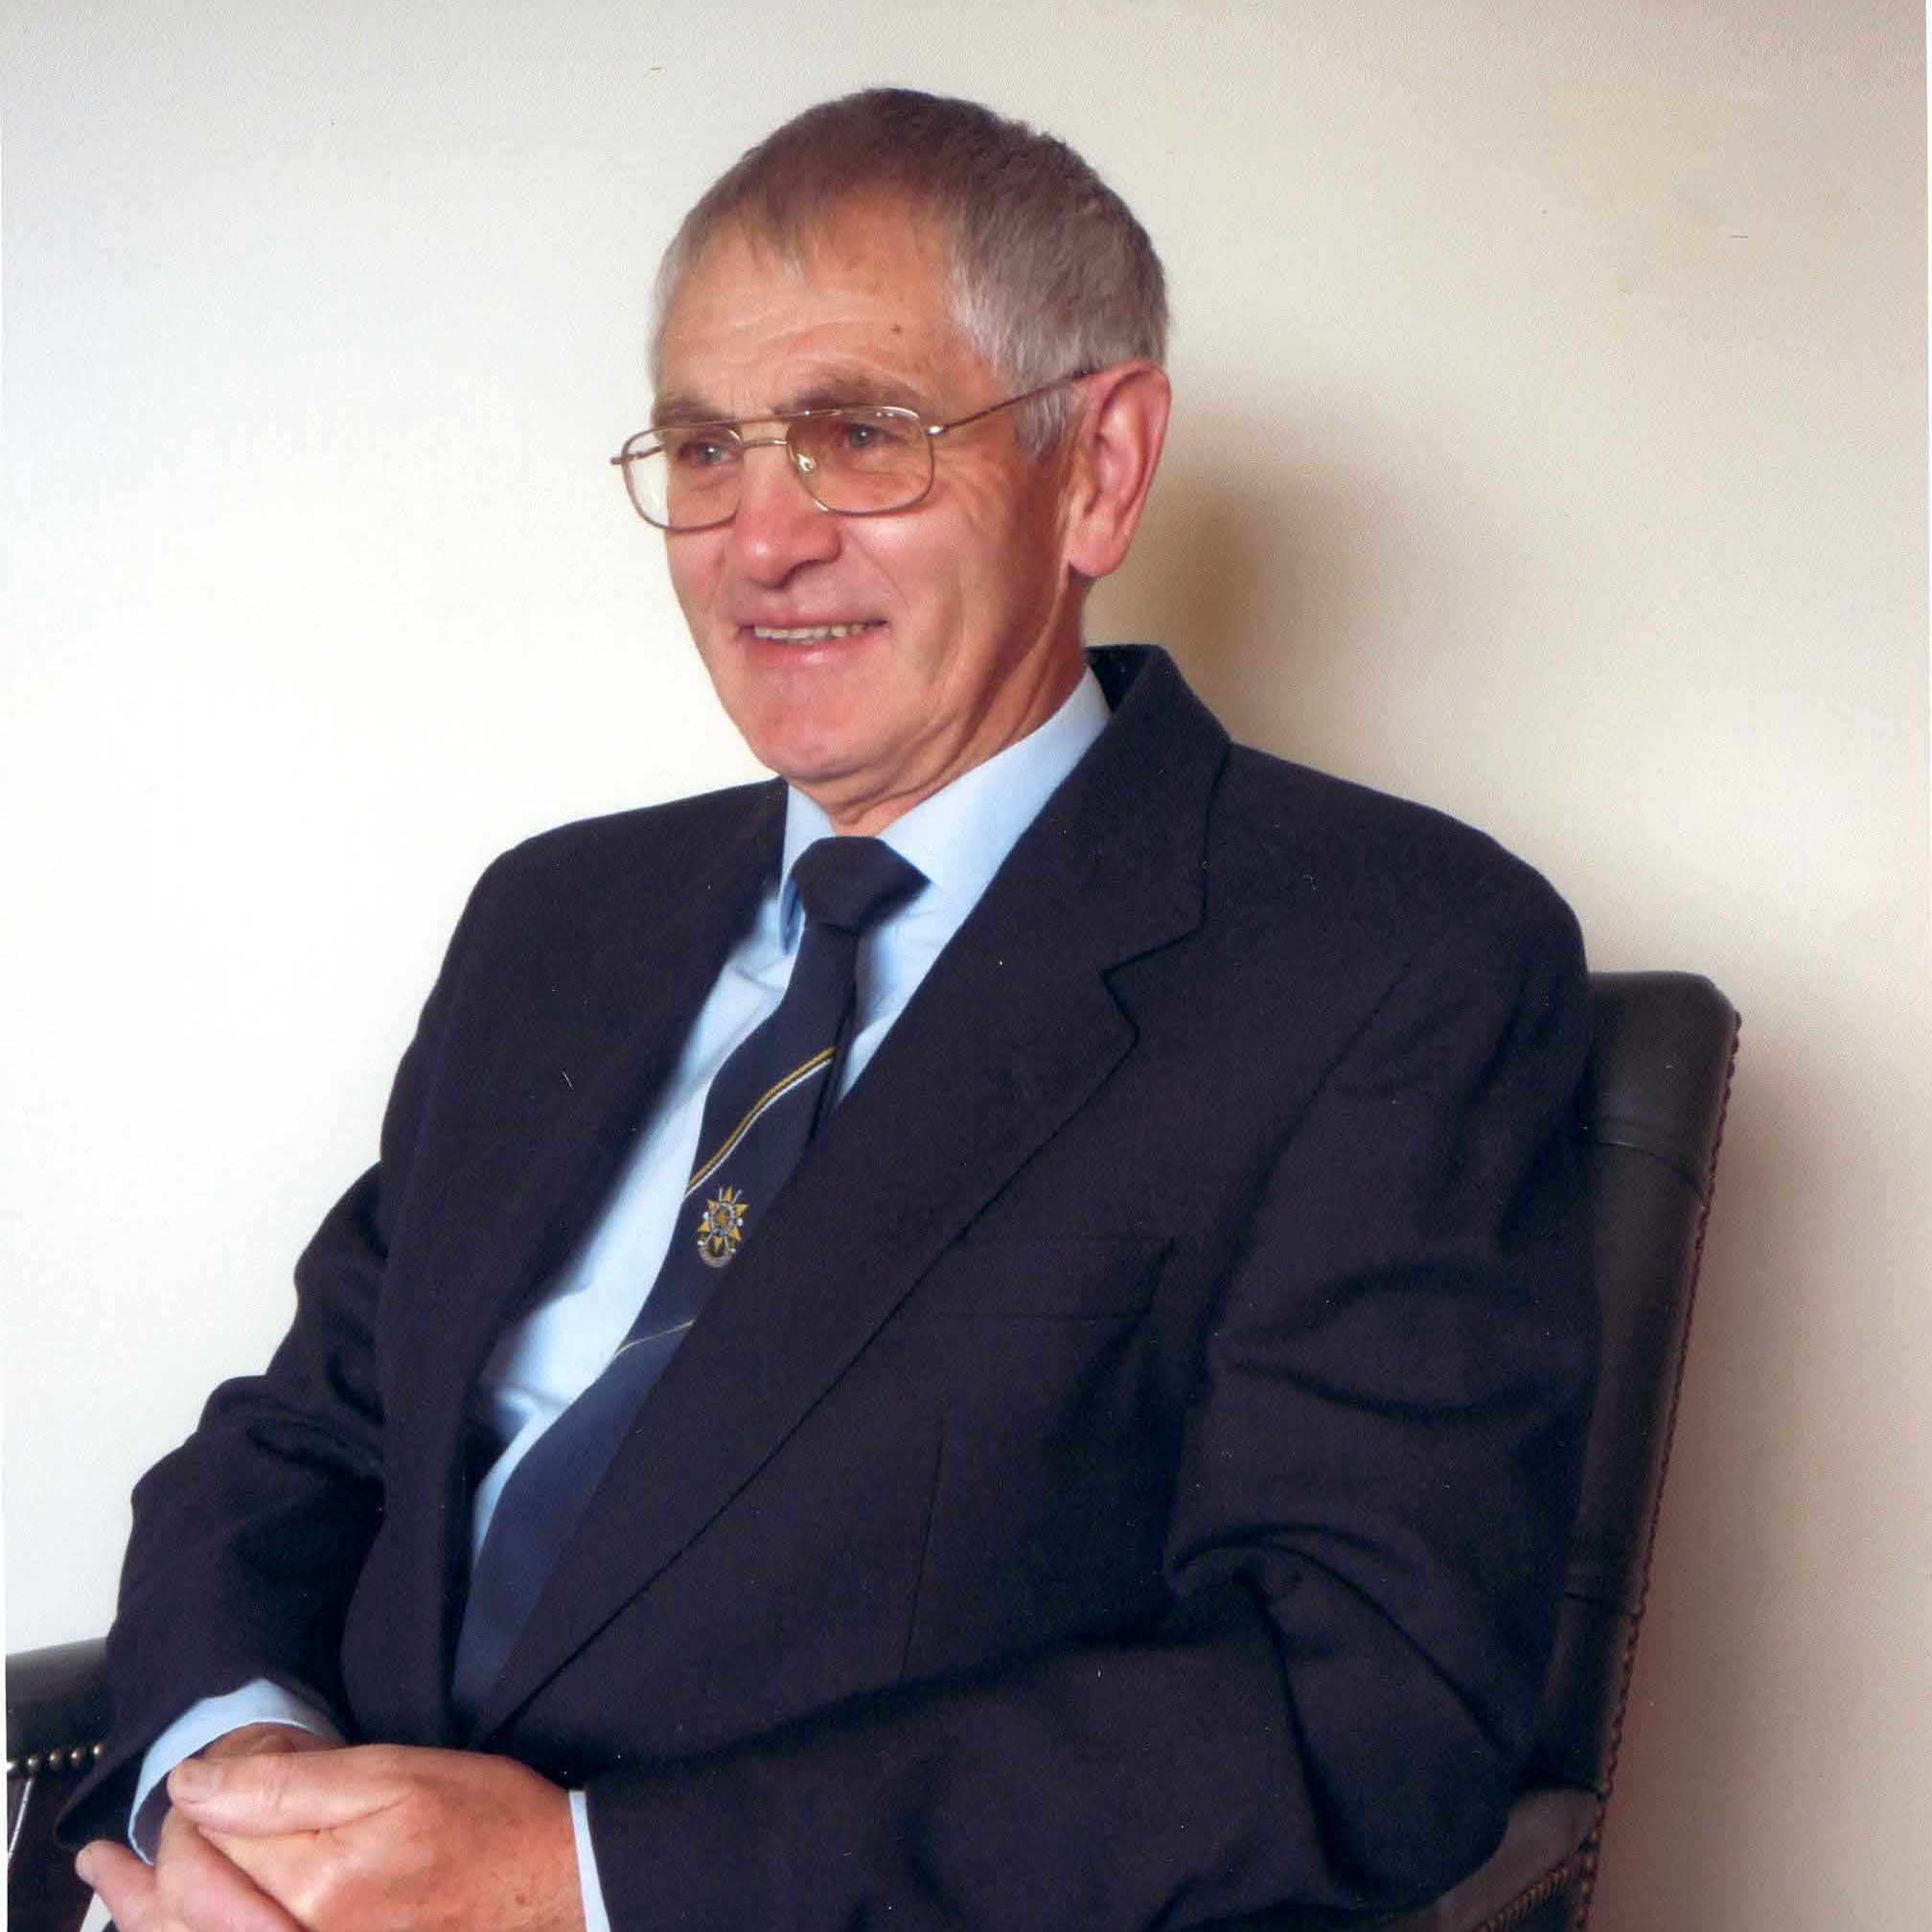 R Gillies - 2007-2009